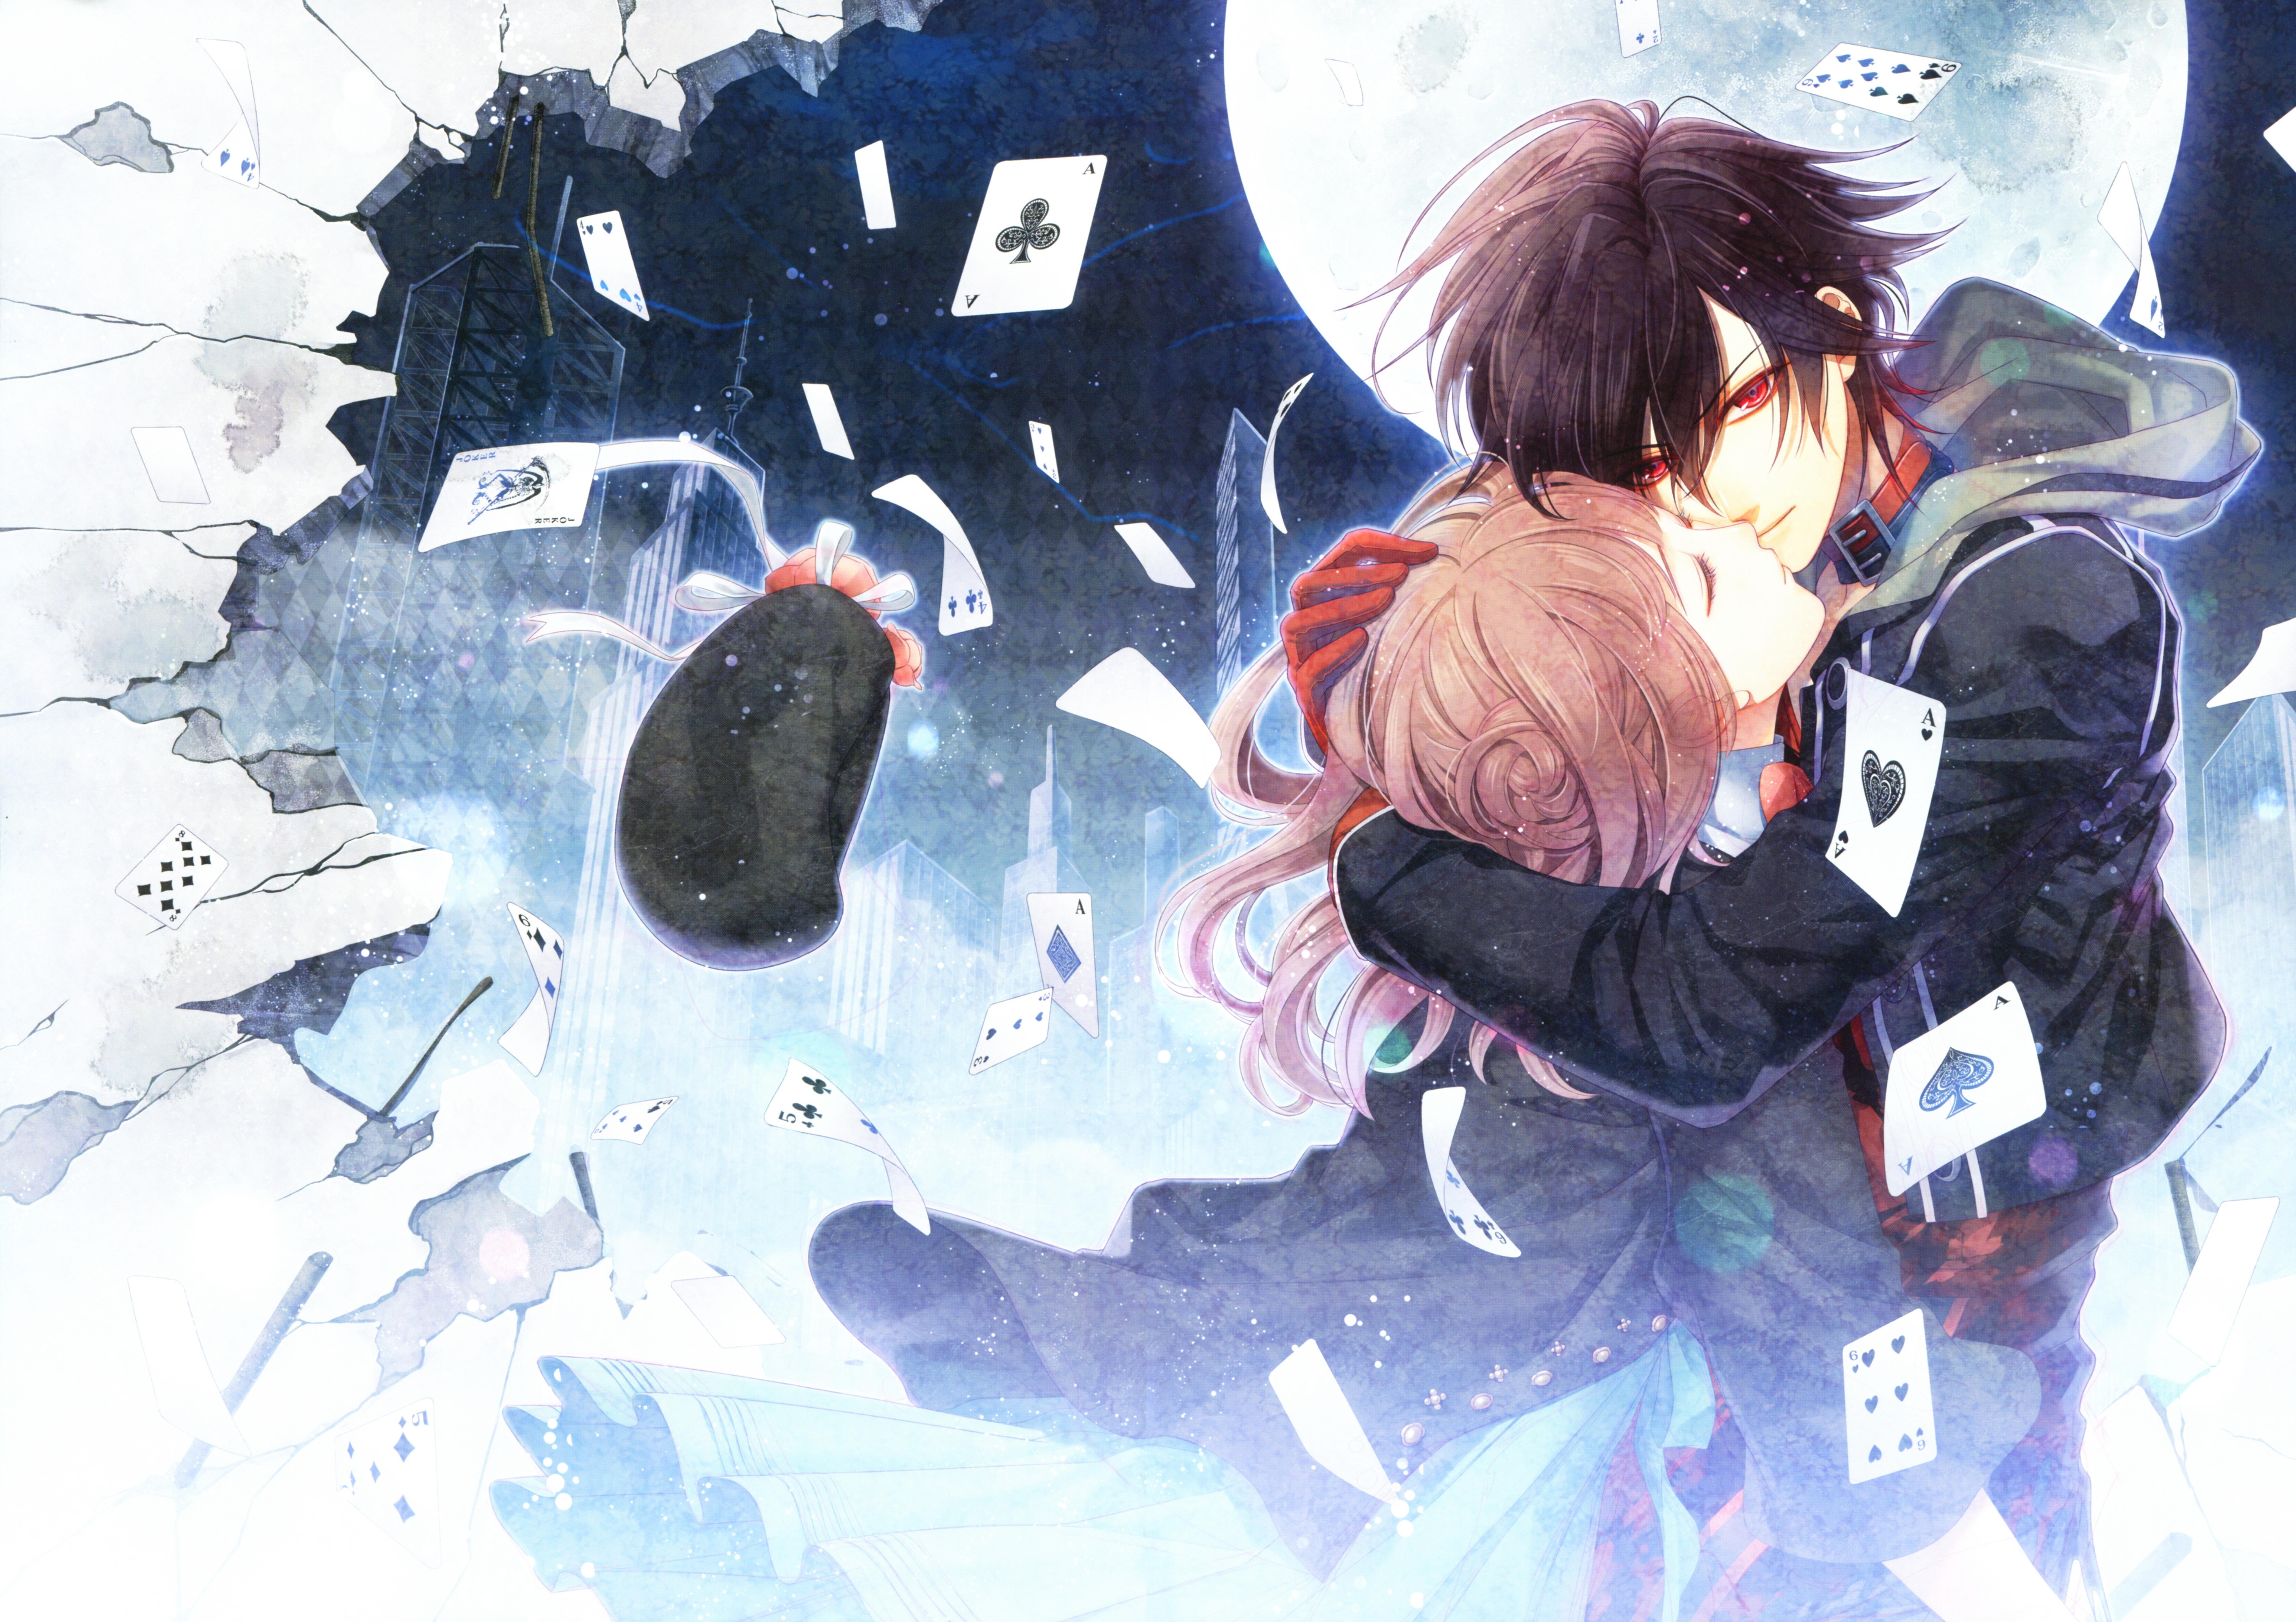 Shin Amnesia Otome Game Wallpaper Resolution 8000x5650 Id Wallha Com